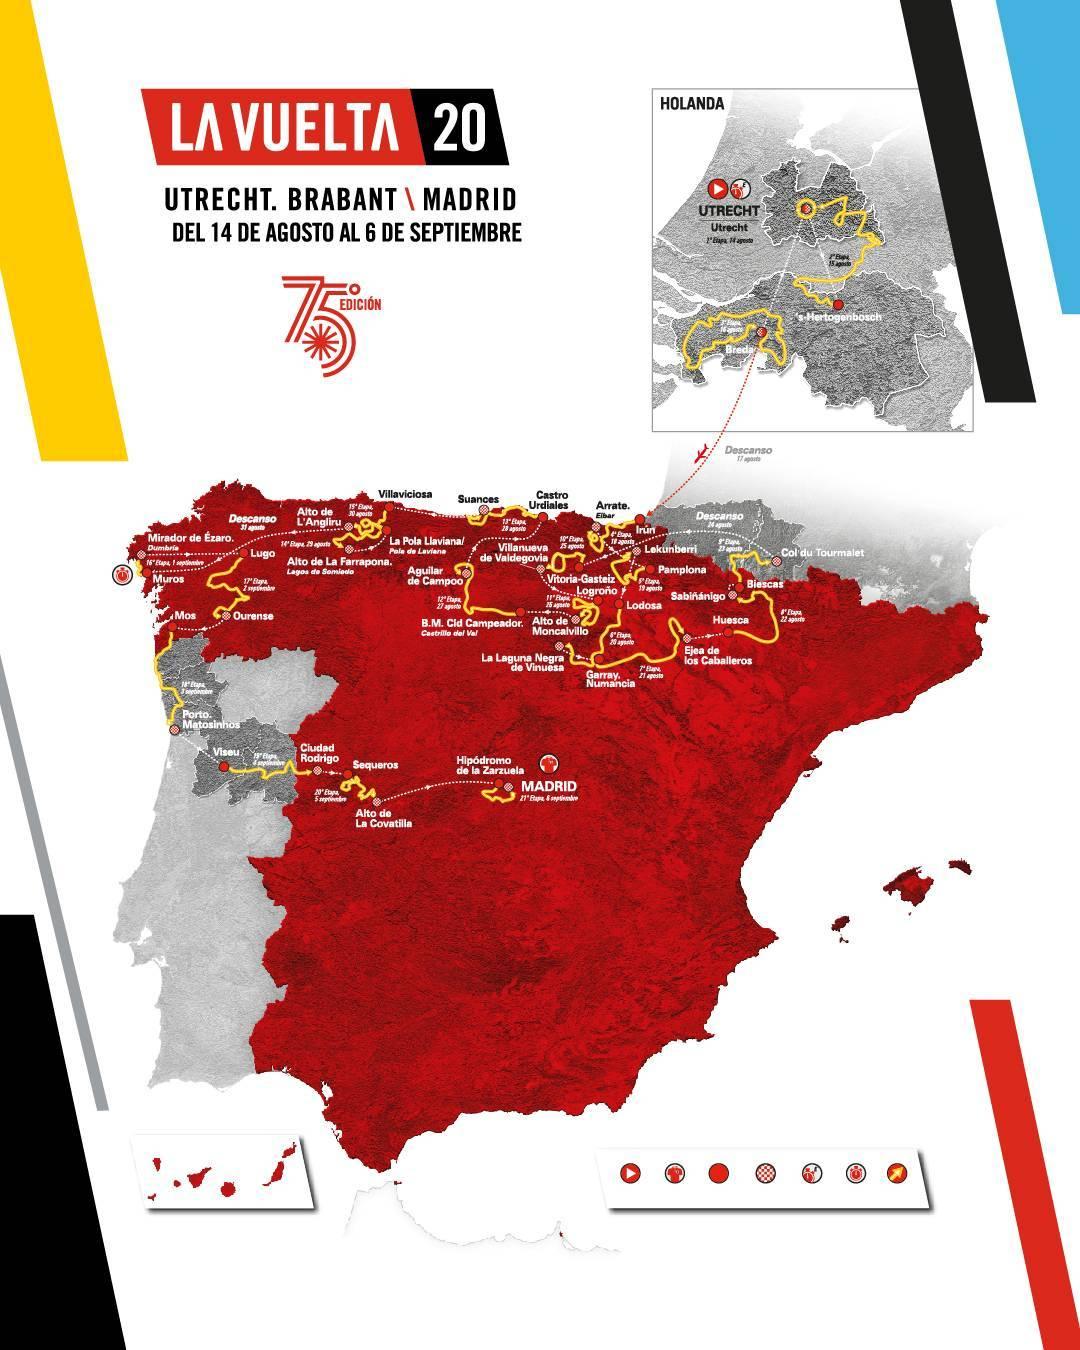 Präsentation Vuelta a España 2020: Streckenkarte